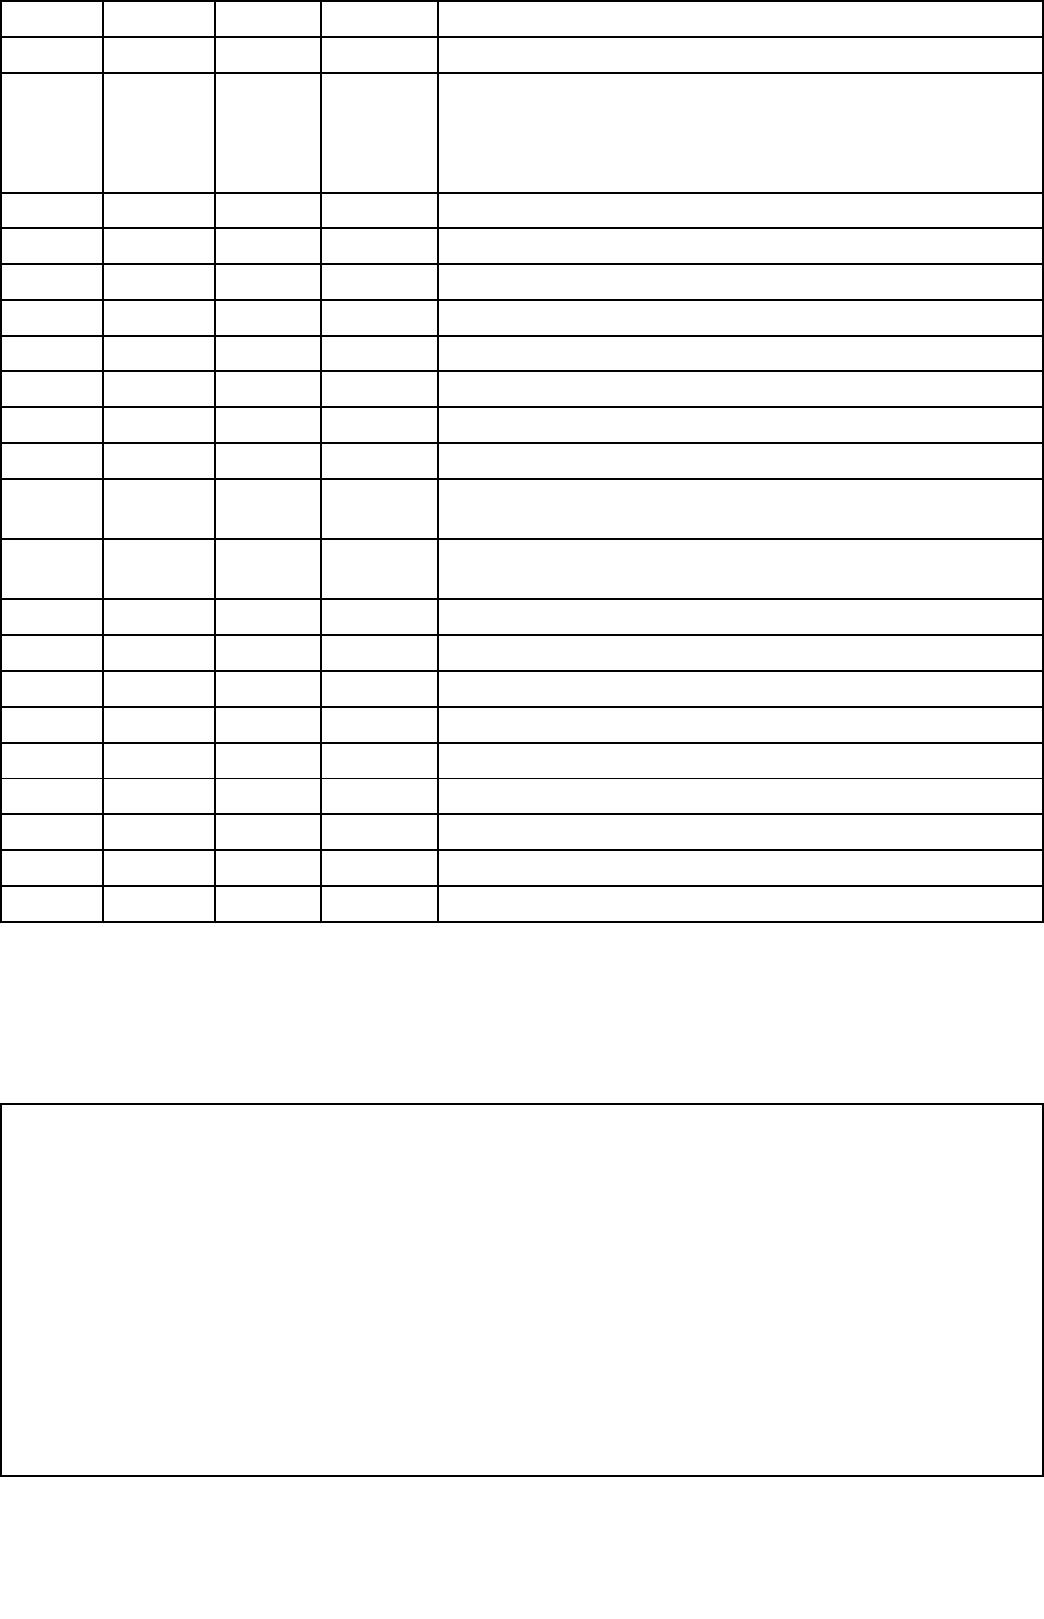 Handleiding Raymarine Ray52 (pagina 100 van 114) (English)